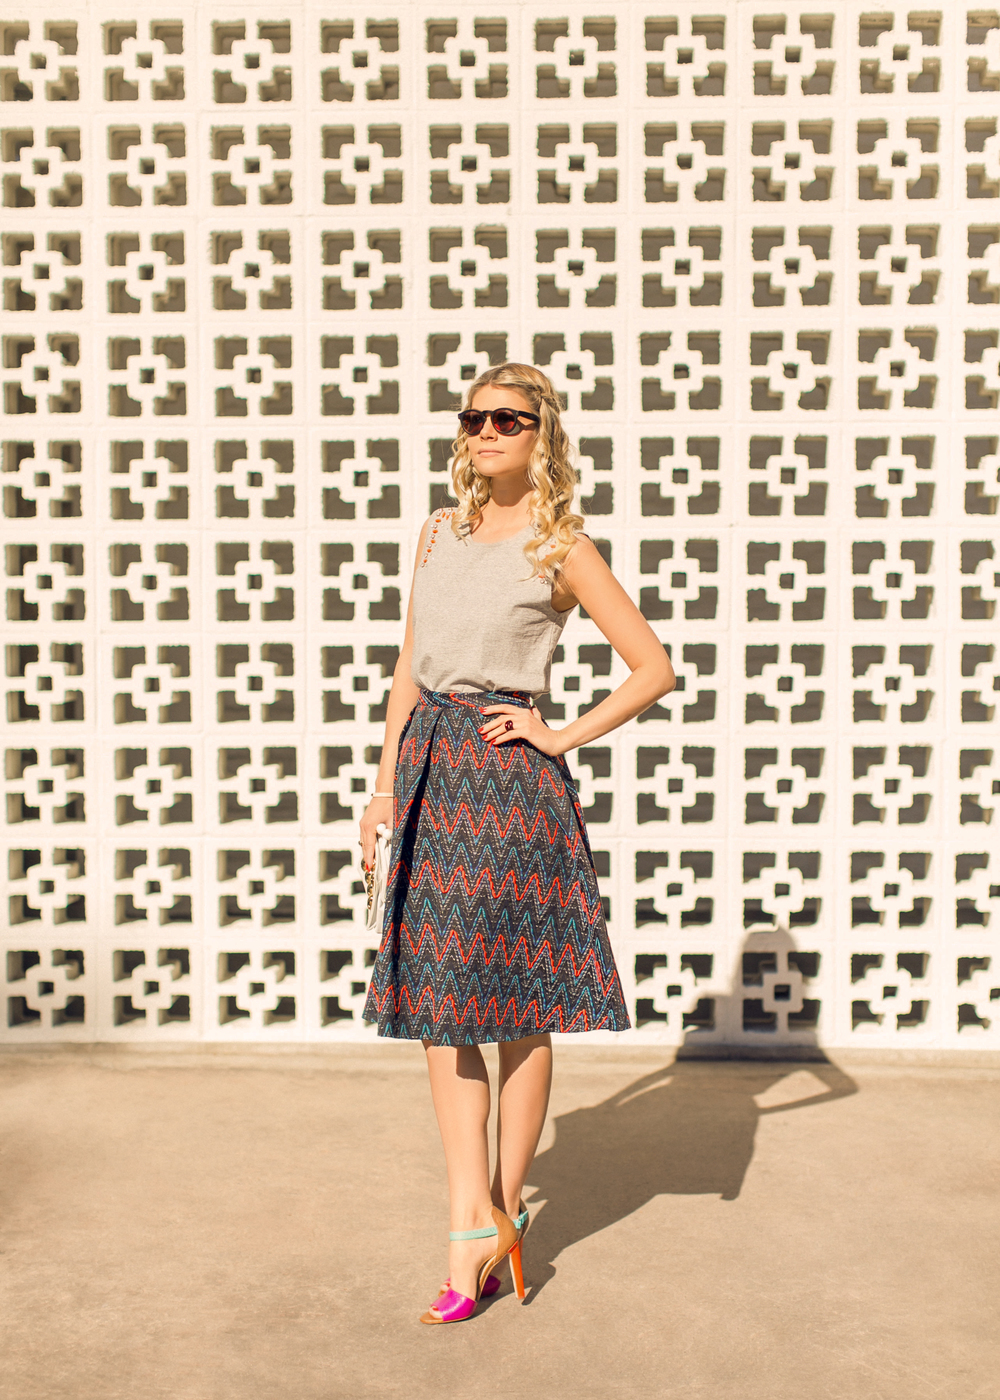 Kate Tikhomirova-11 23 Palm Springs Part 1-0182.jpg